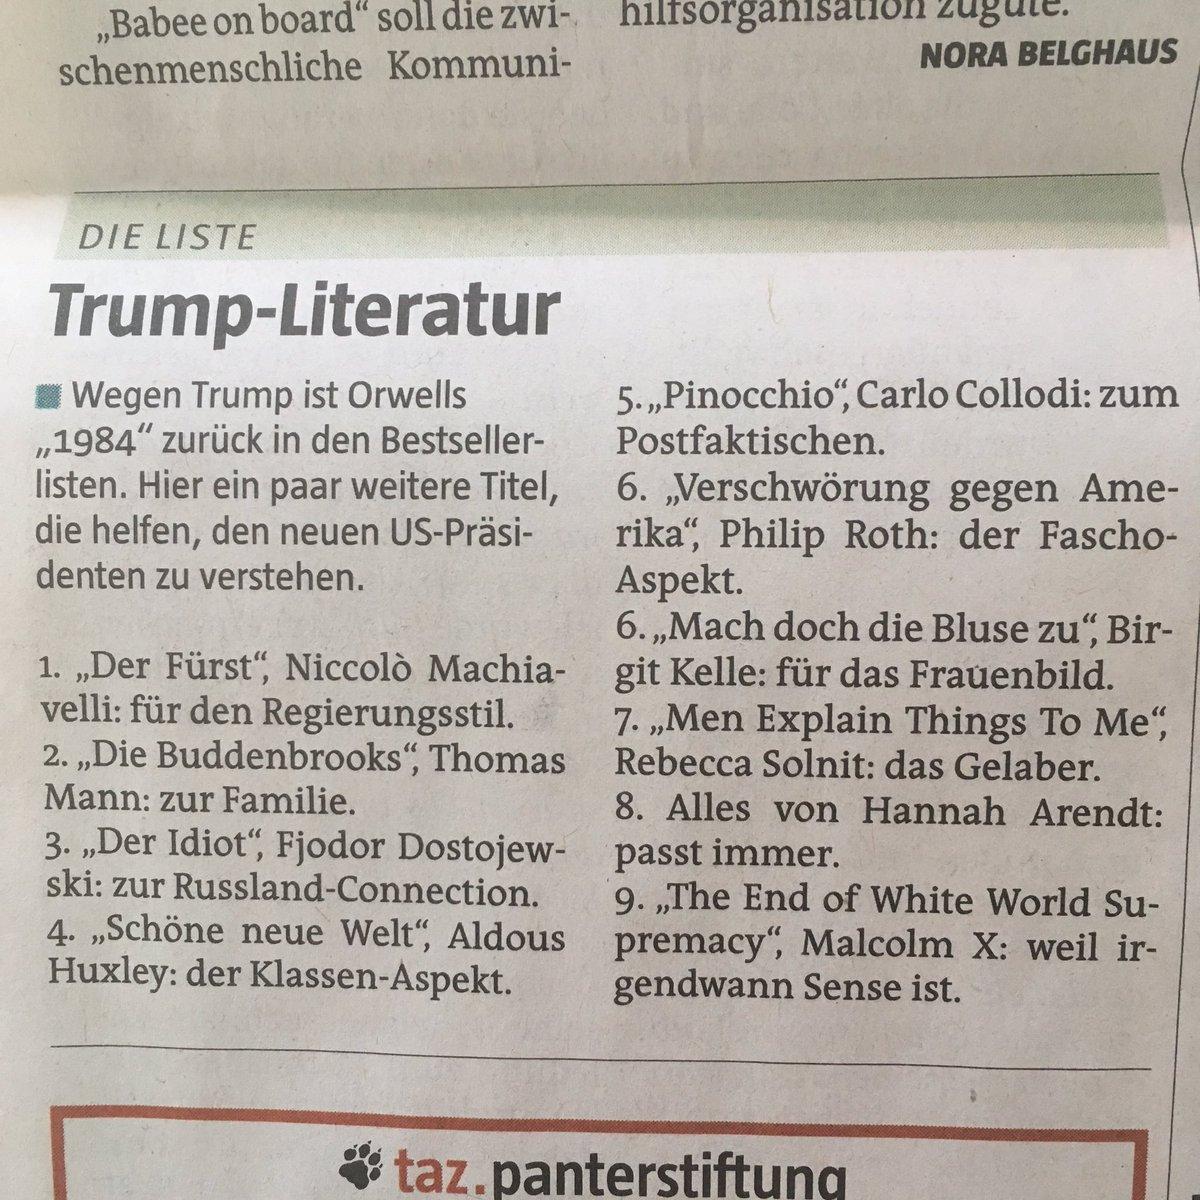 Am Frühstückstisch schon gelacht #LesenGegenTrump @tazgezwitscher https://t.co/Mh7LfabTU0